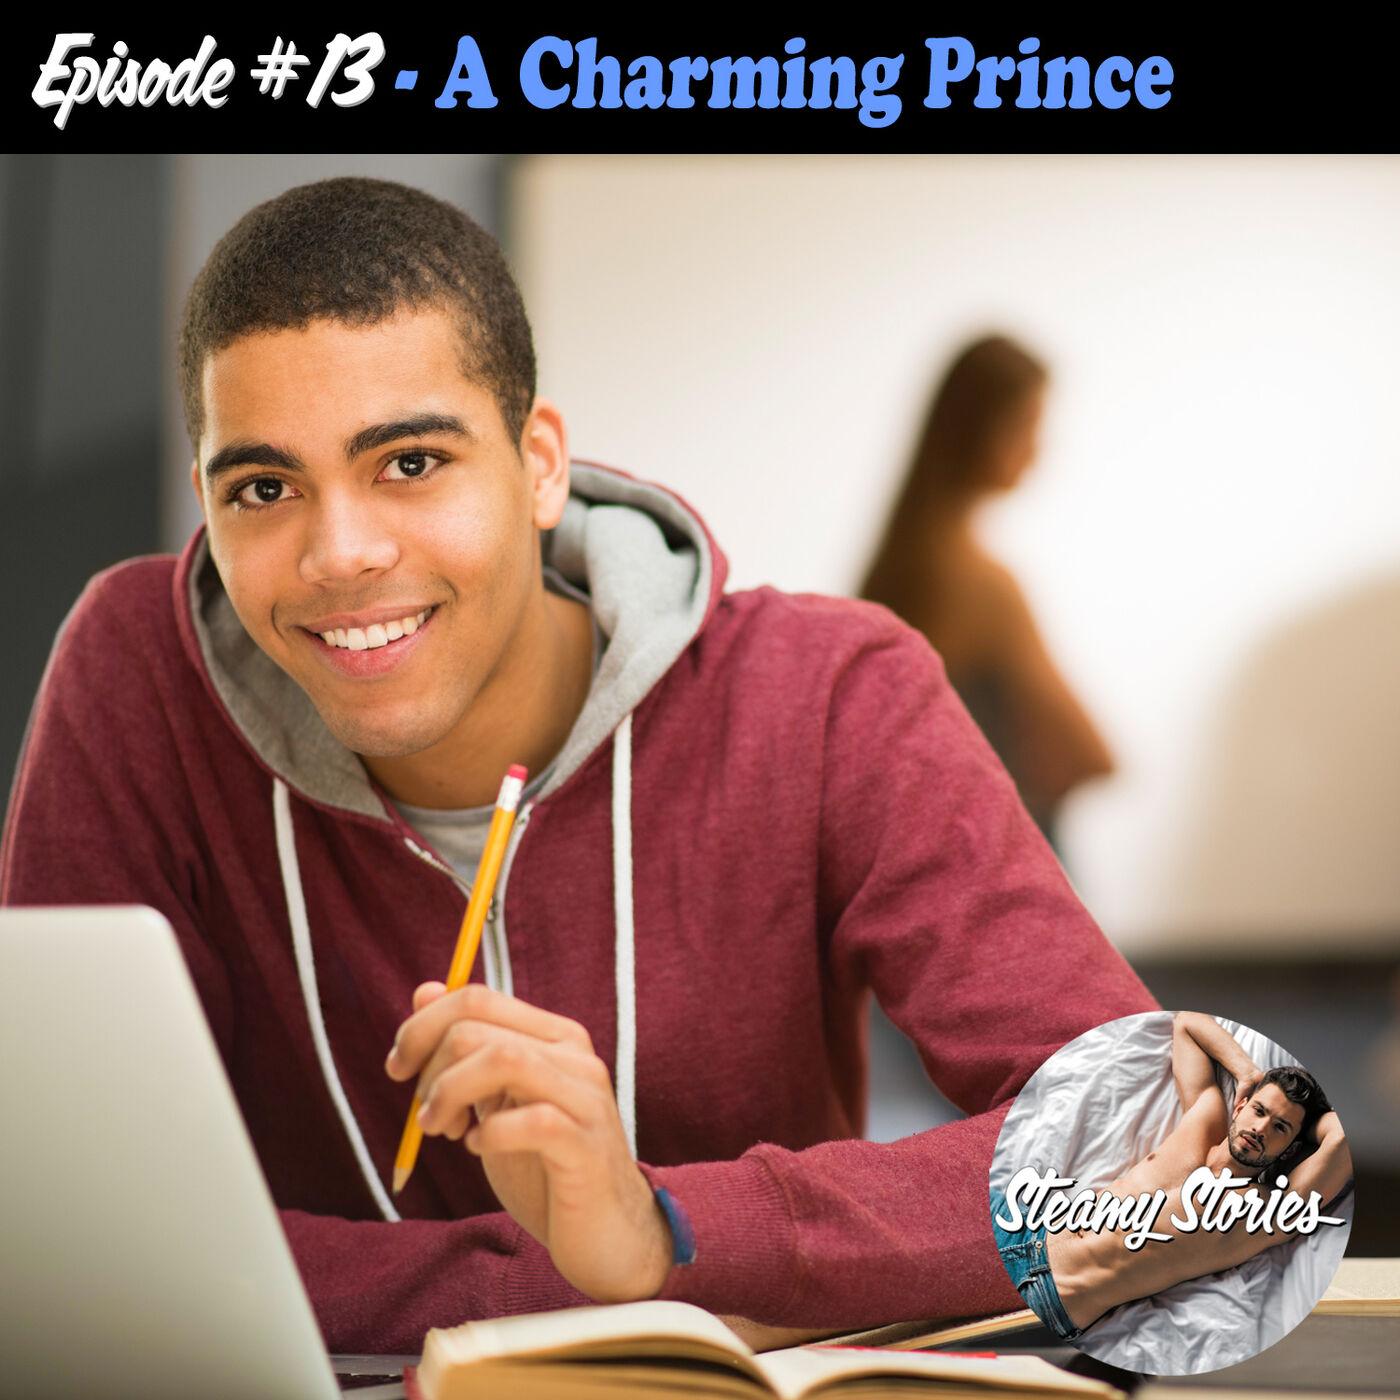 13. A Charming Prince